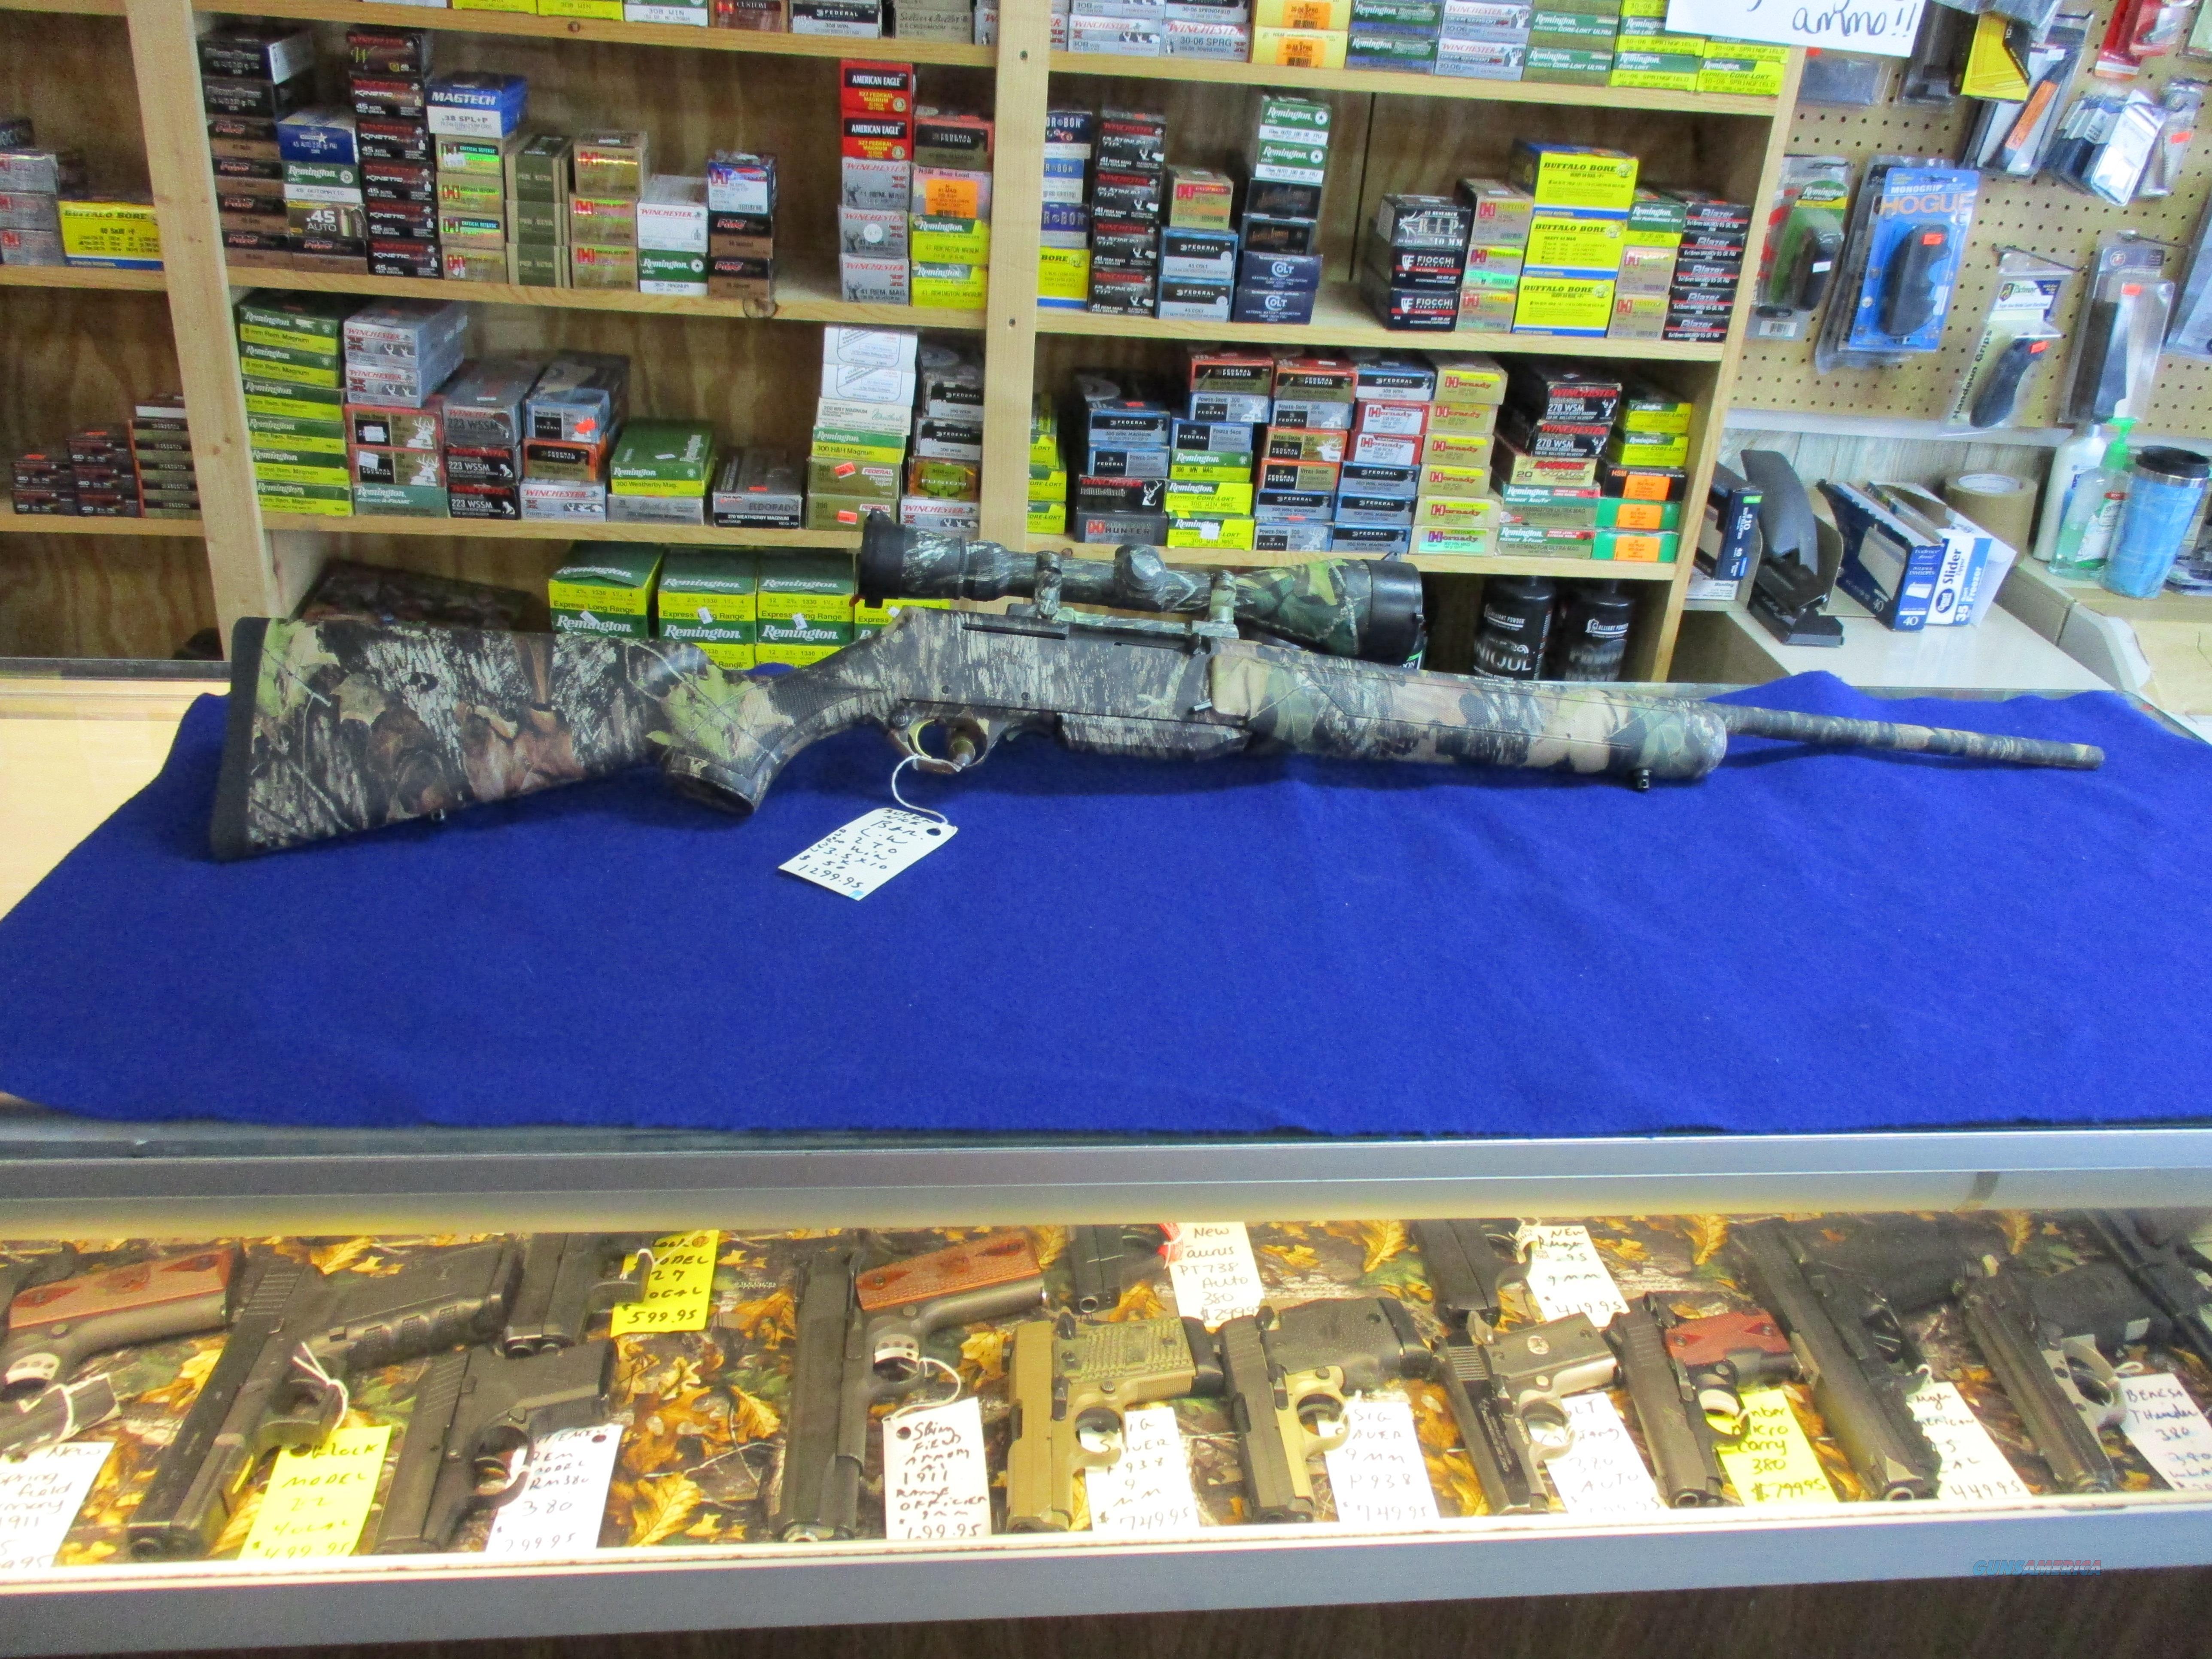 BROWNING BAR LW 270 WIN 3.5X10X50 VX3 LEUPOLD  Guns > Rifles > Browning Rifles > Semi Auto > Hunting